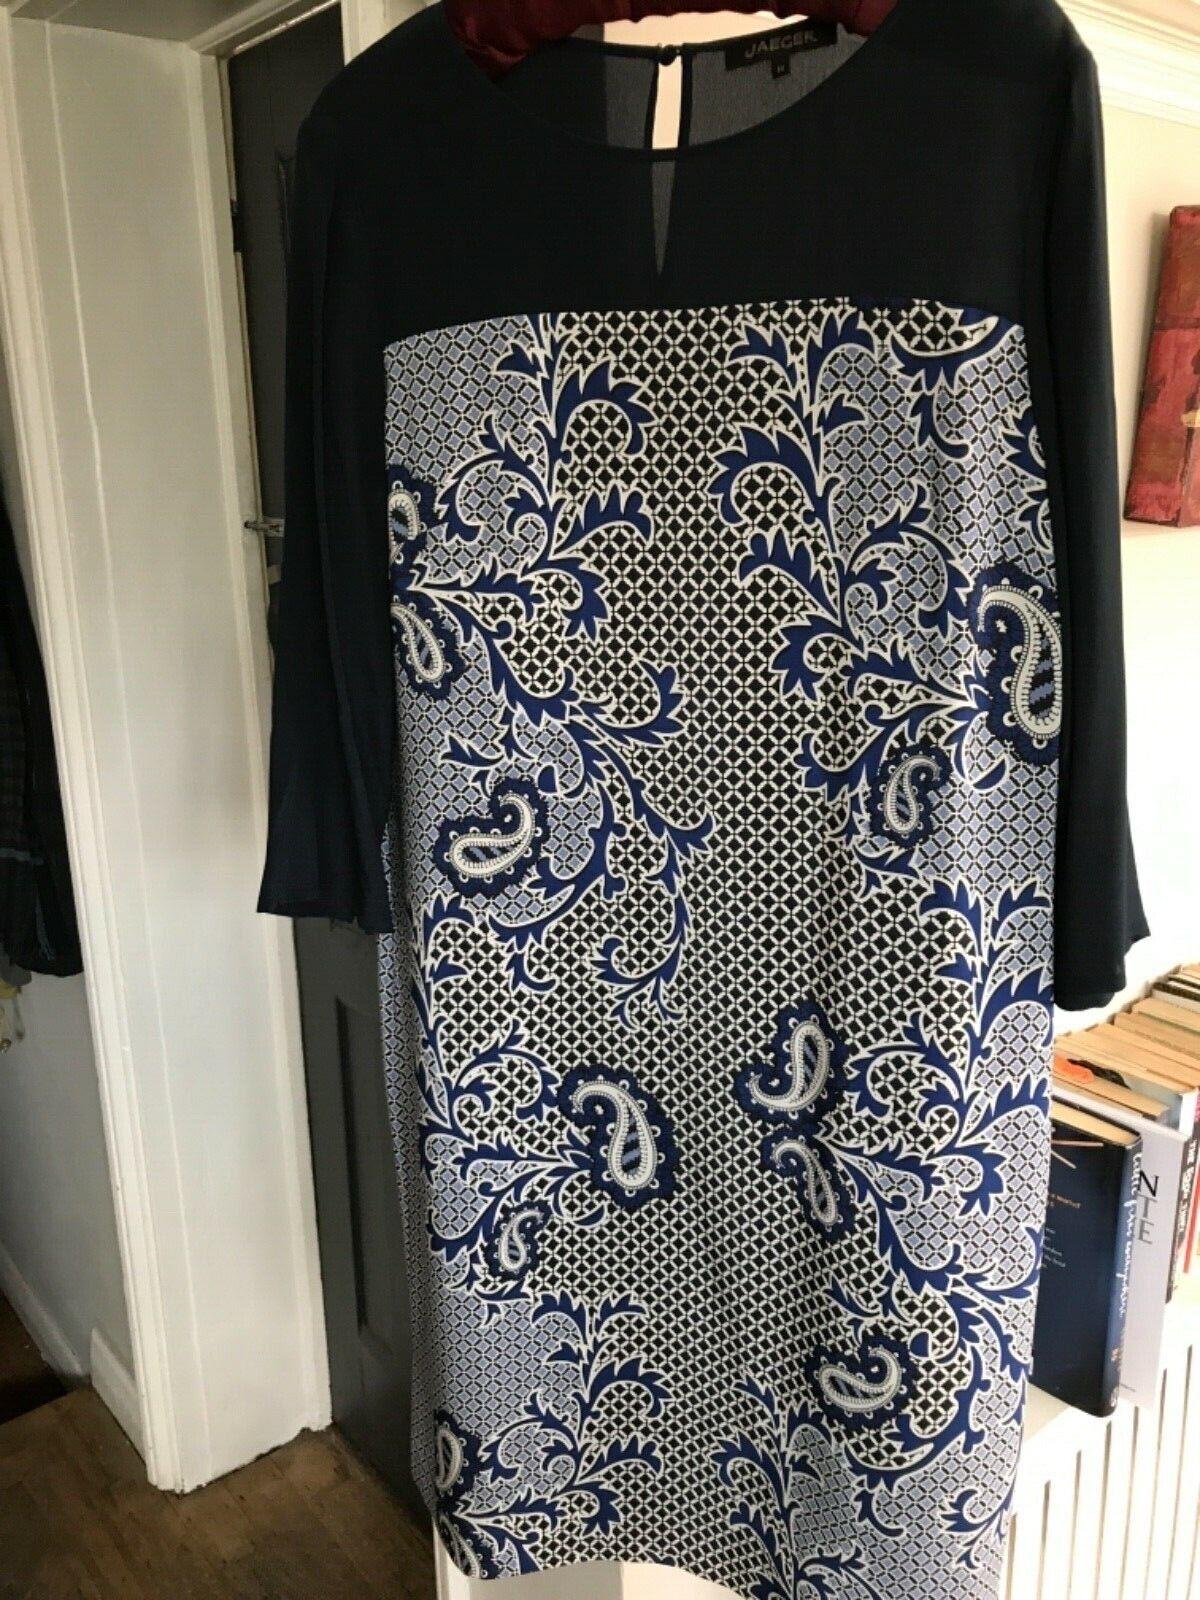 Jaeger Soie Bleu Marine Robe à fleurs-Taille 14